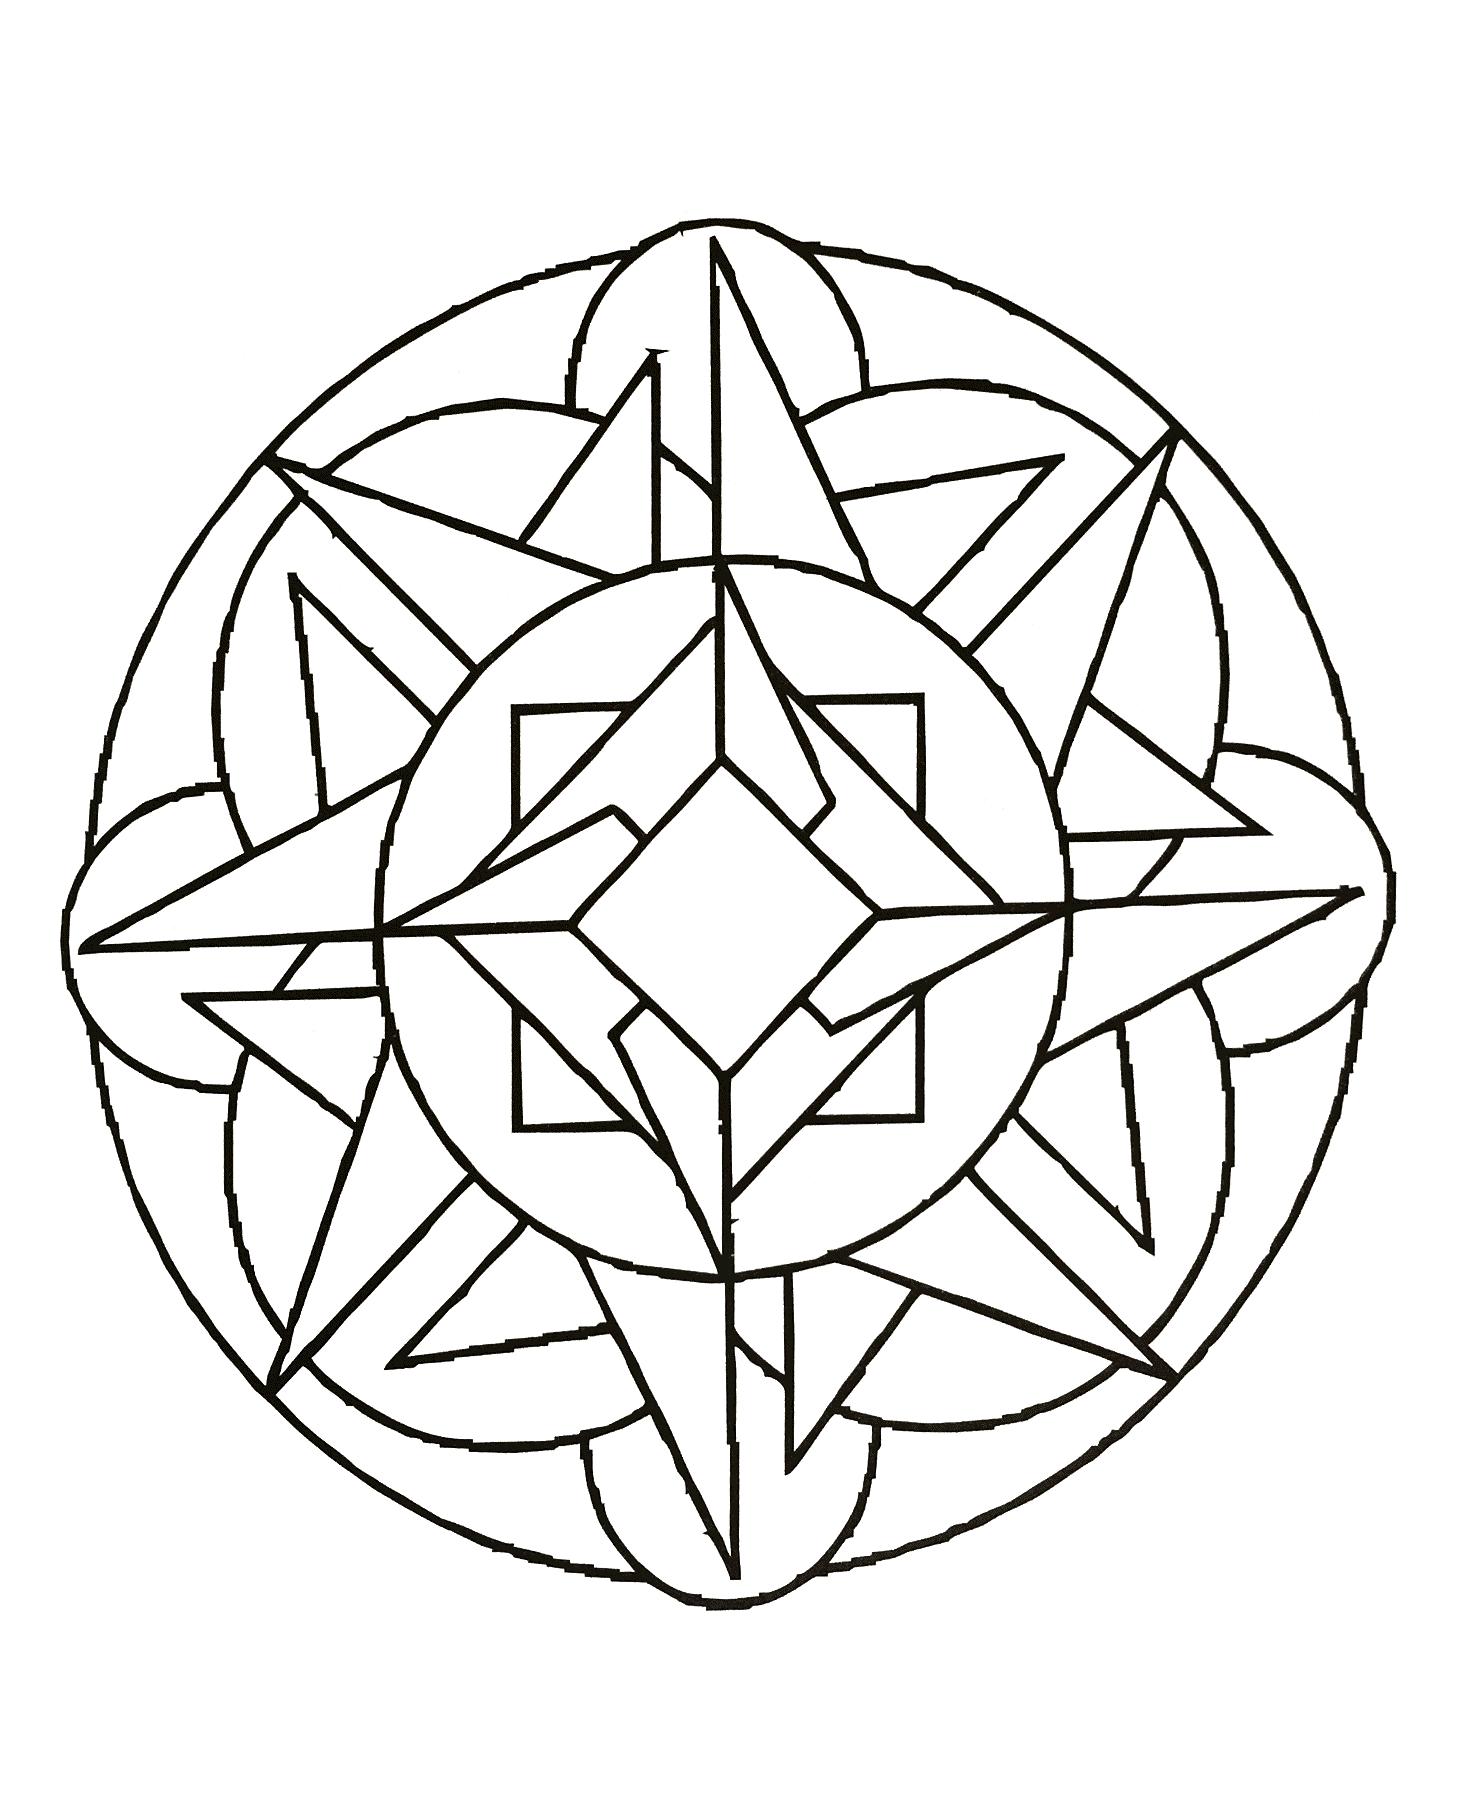 Mandalas for kids - Mandalas Kids Coloring Pages